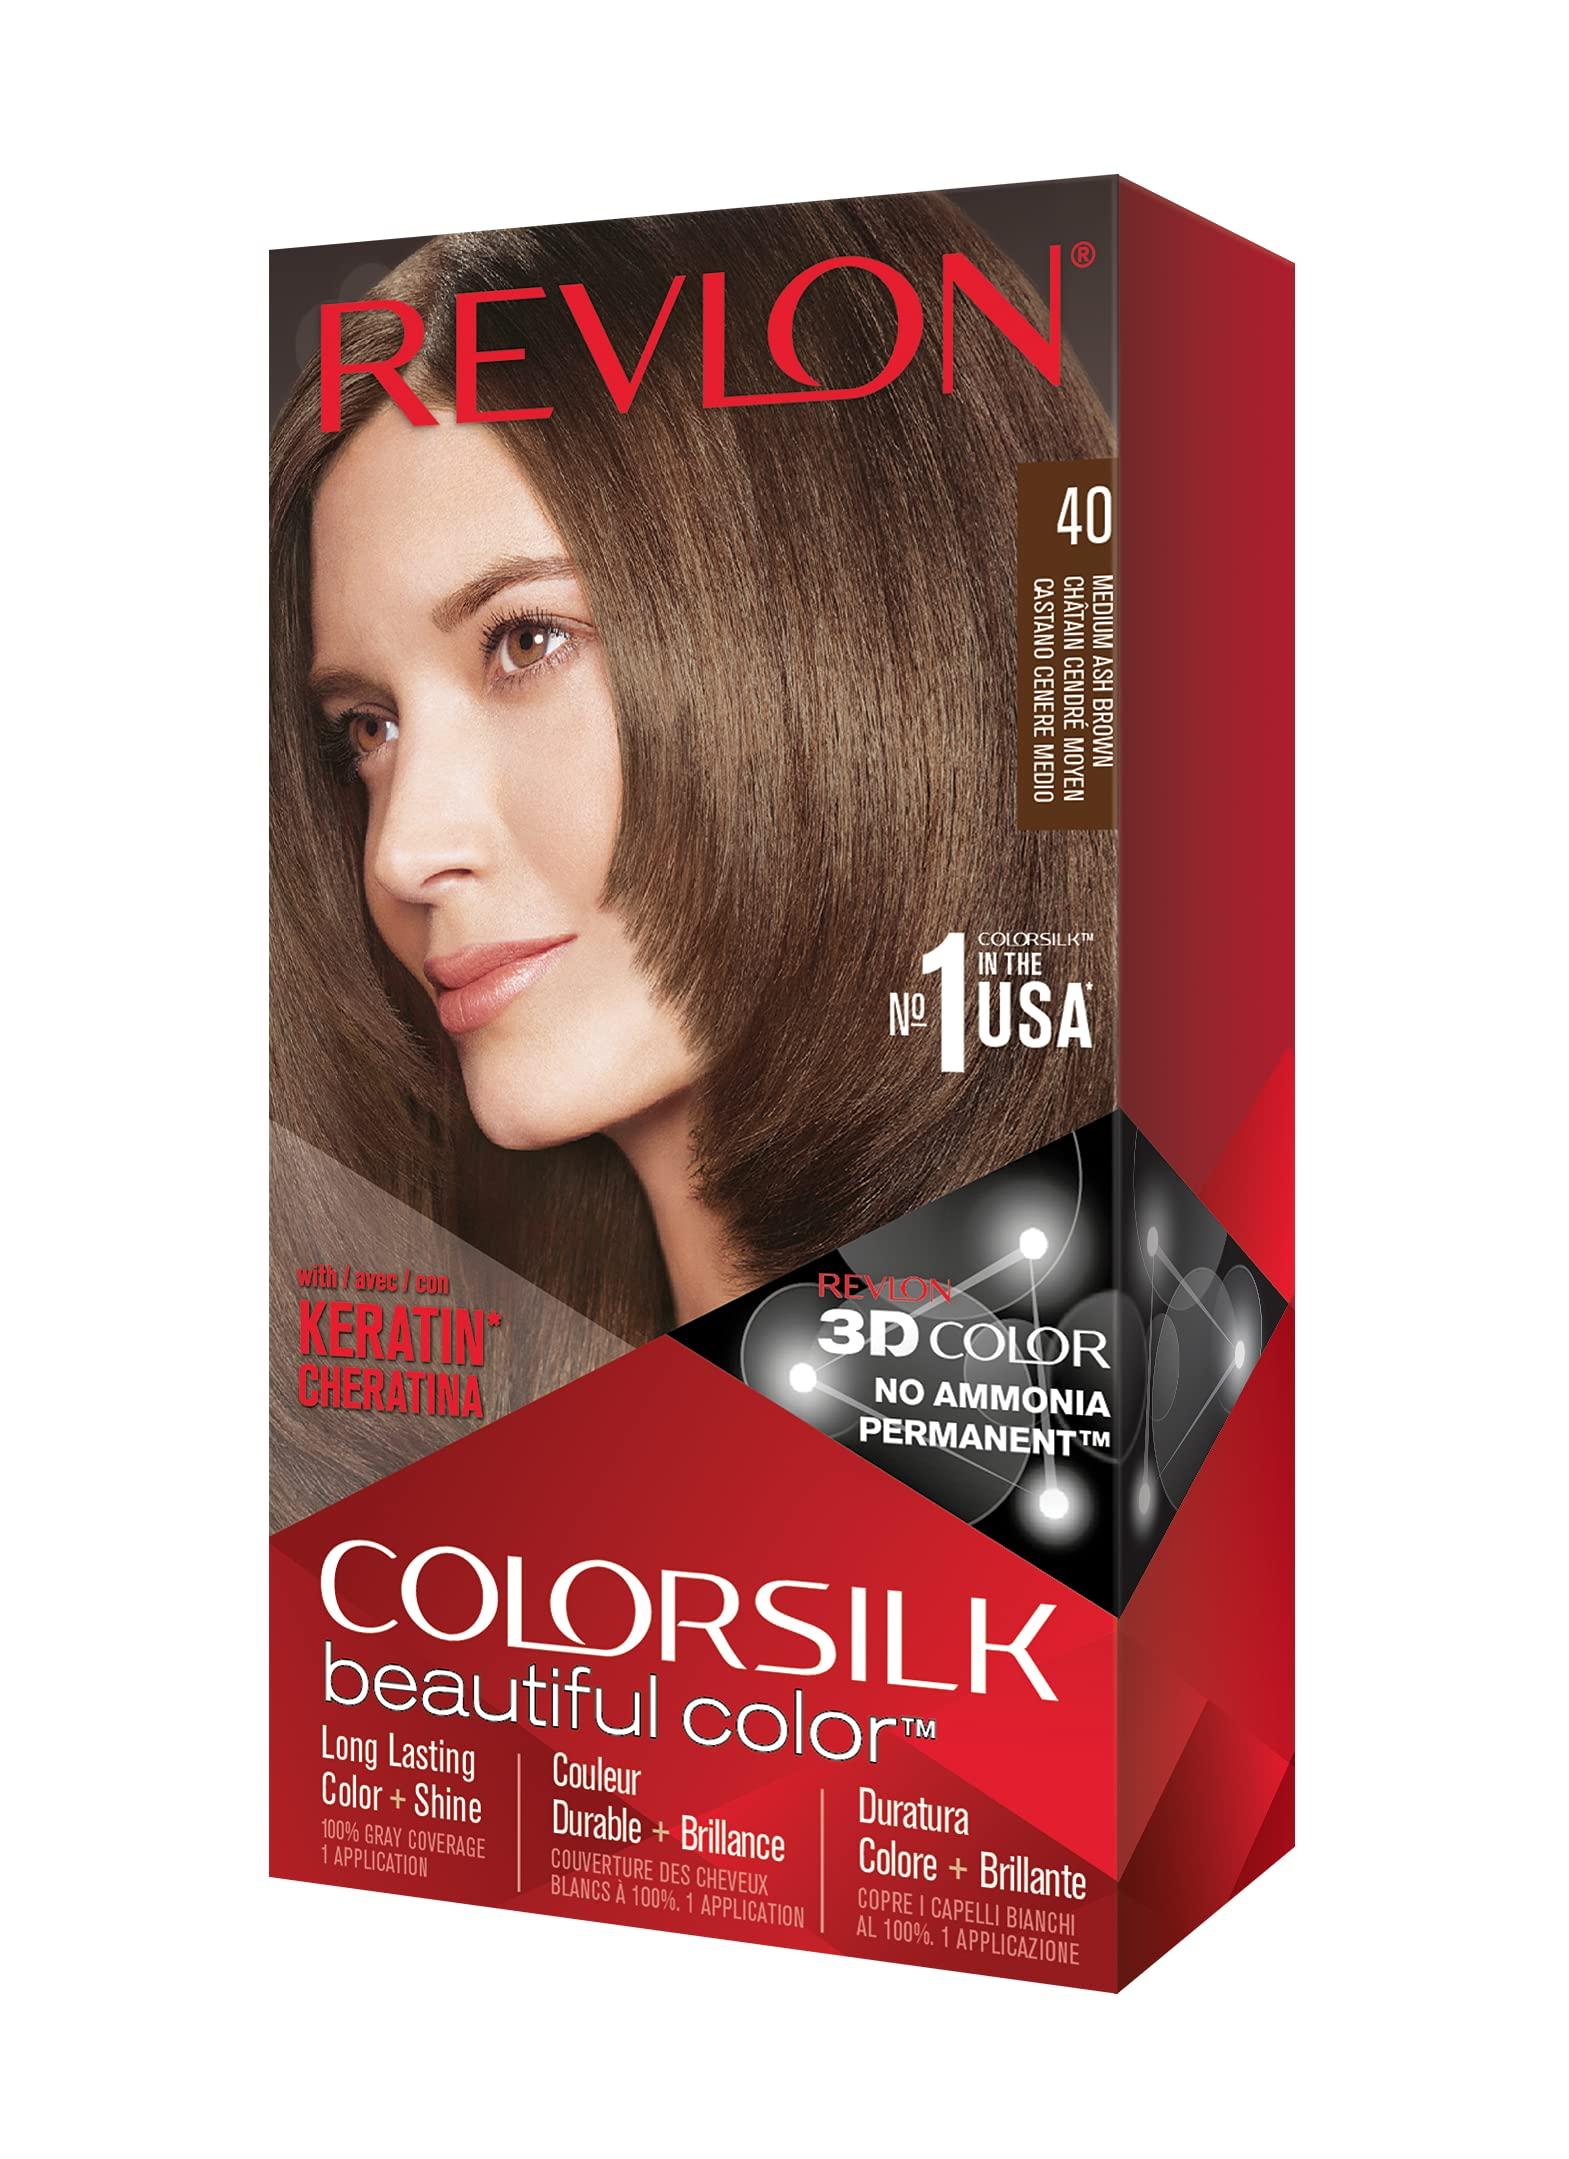 Revlon Colorsilk Beautiful Color Permanent Hair Color with 3D Gel Technology & Keratin, 100% Gray Coverage Hair Dye, 40 Medium Ash Brown